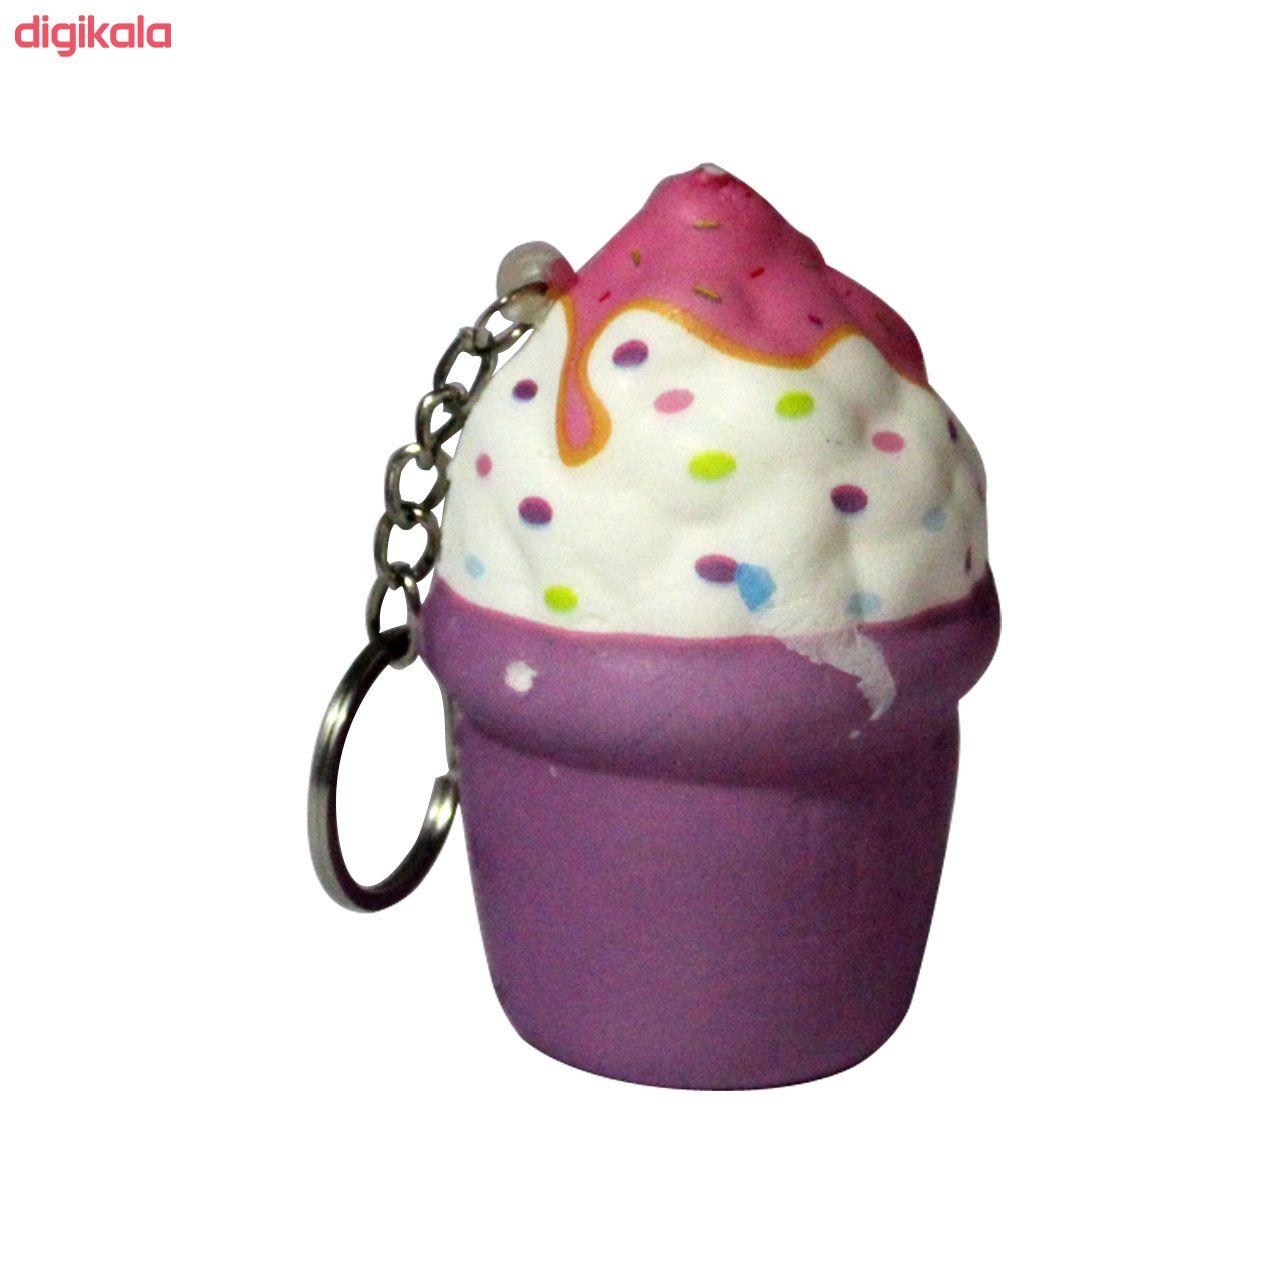 اسکوییشی مدل بستنی قیفی کد 5 main 1 4